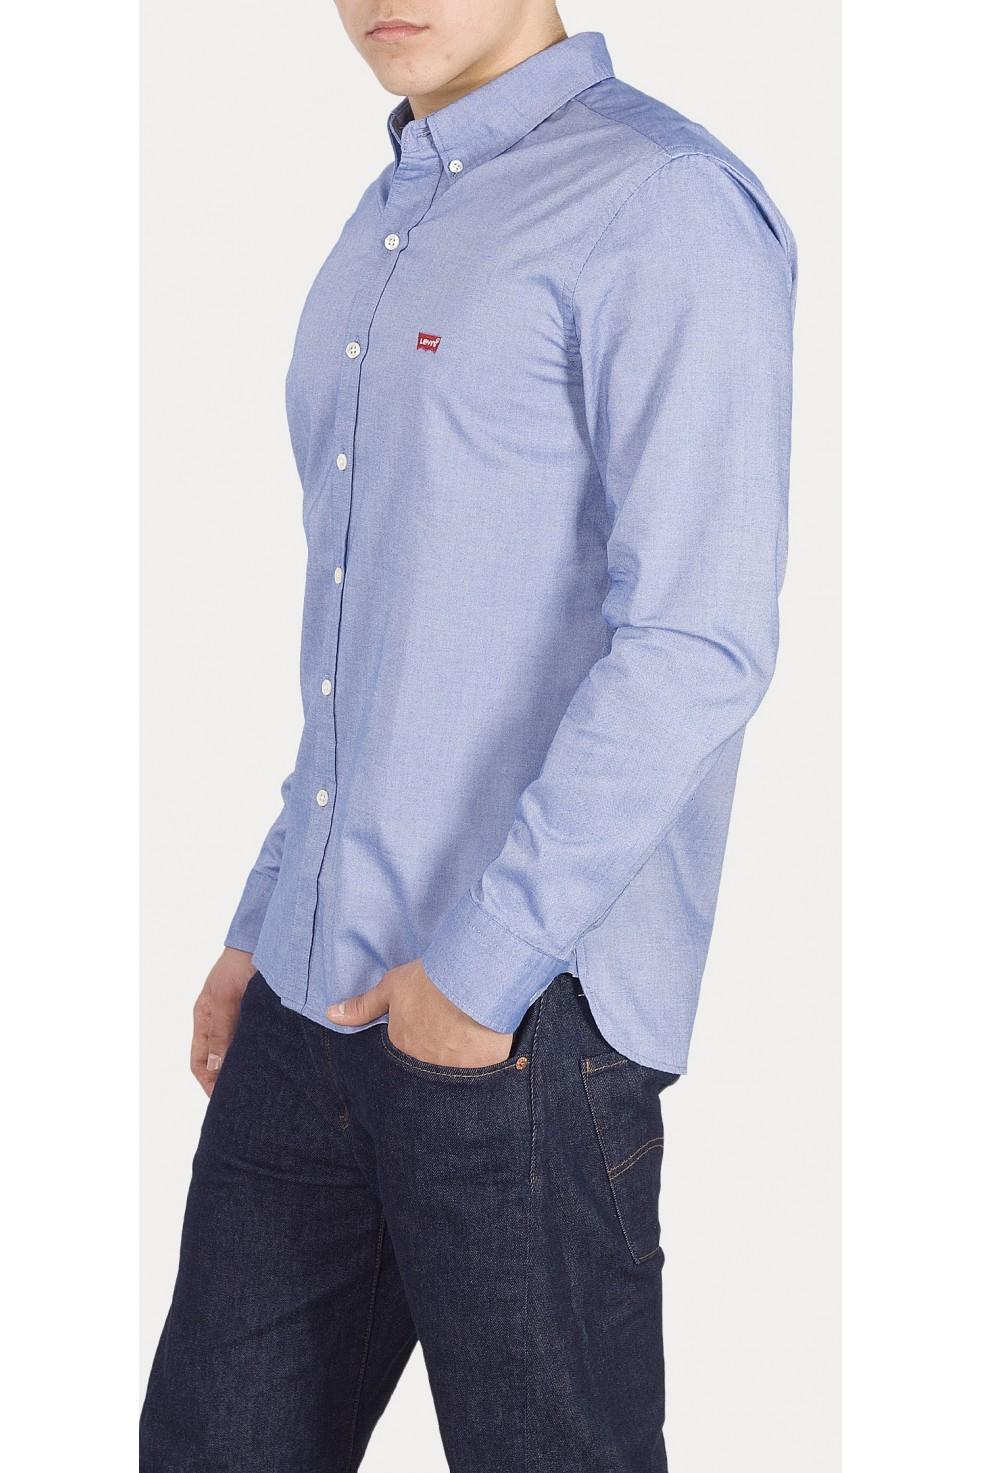 Levis-Erkek-Gömlek-Ls-Housemark-Shirt-74389-0001